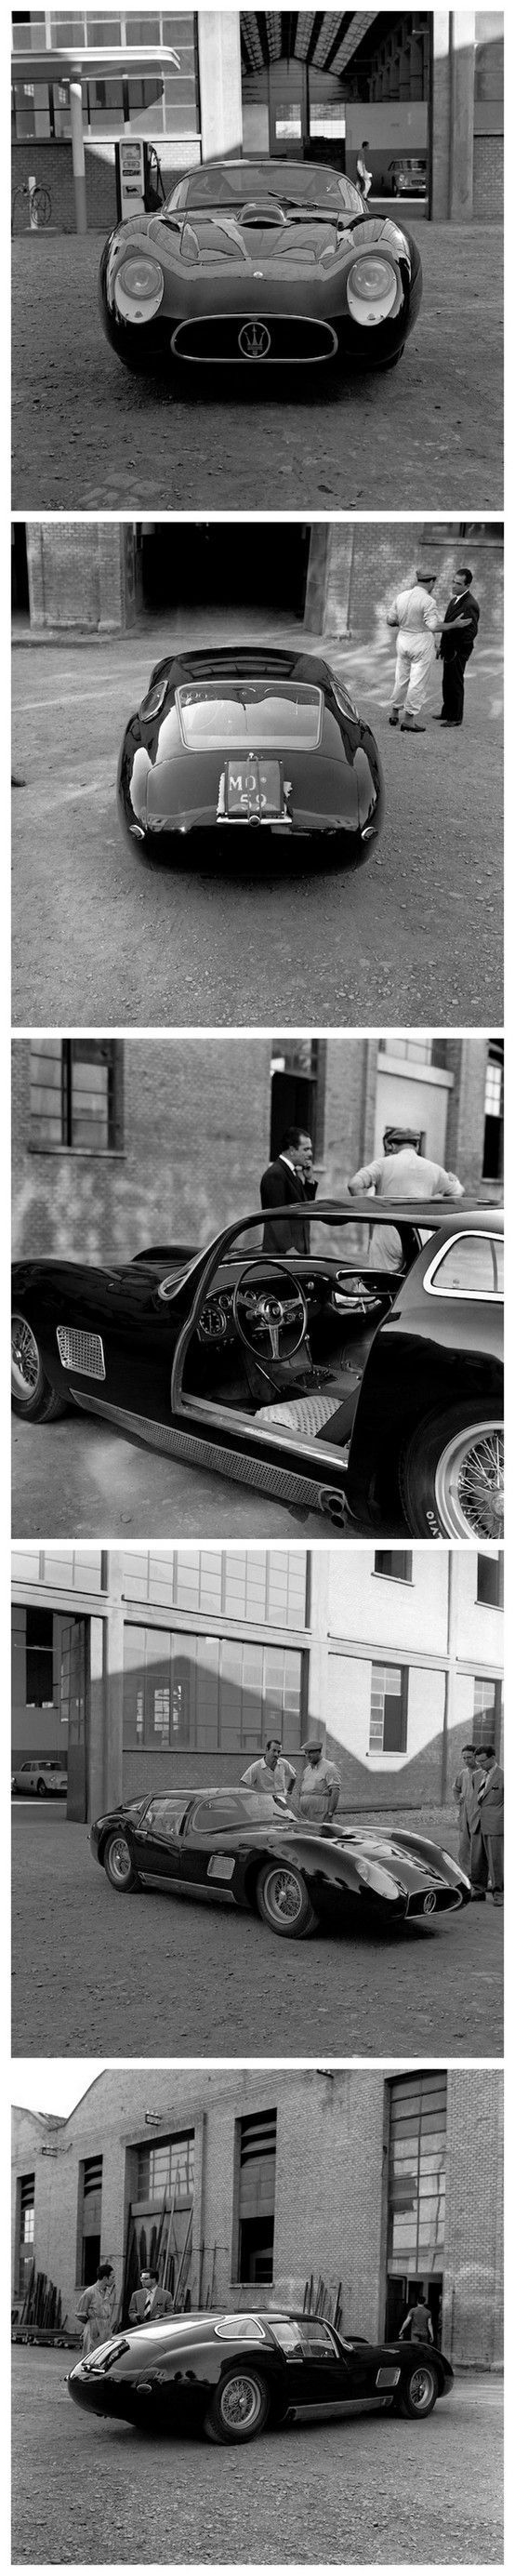 Maserati 4.5 Coupe Maserati Factory, Modena 1958 Photos by Jesse Alexander – bmw